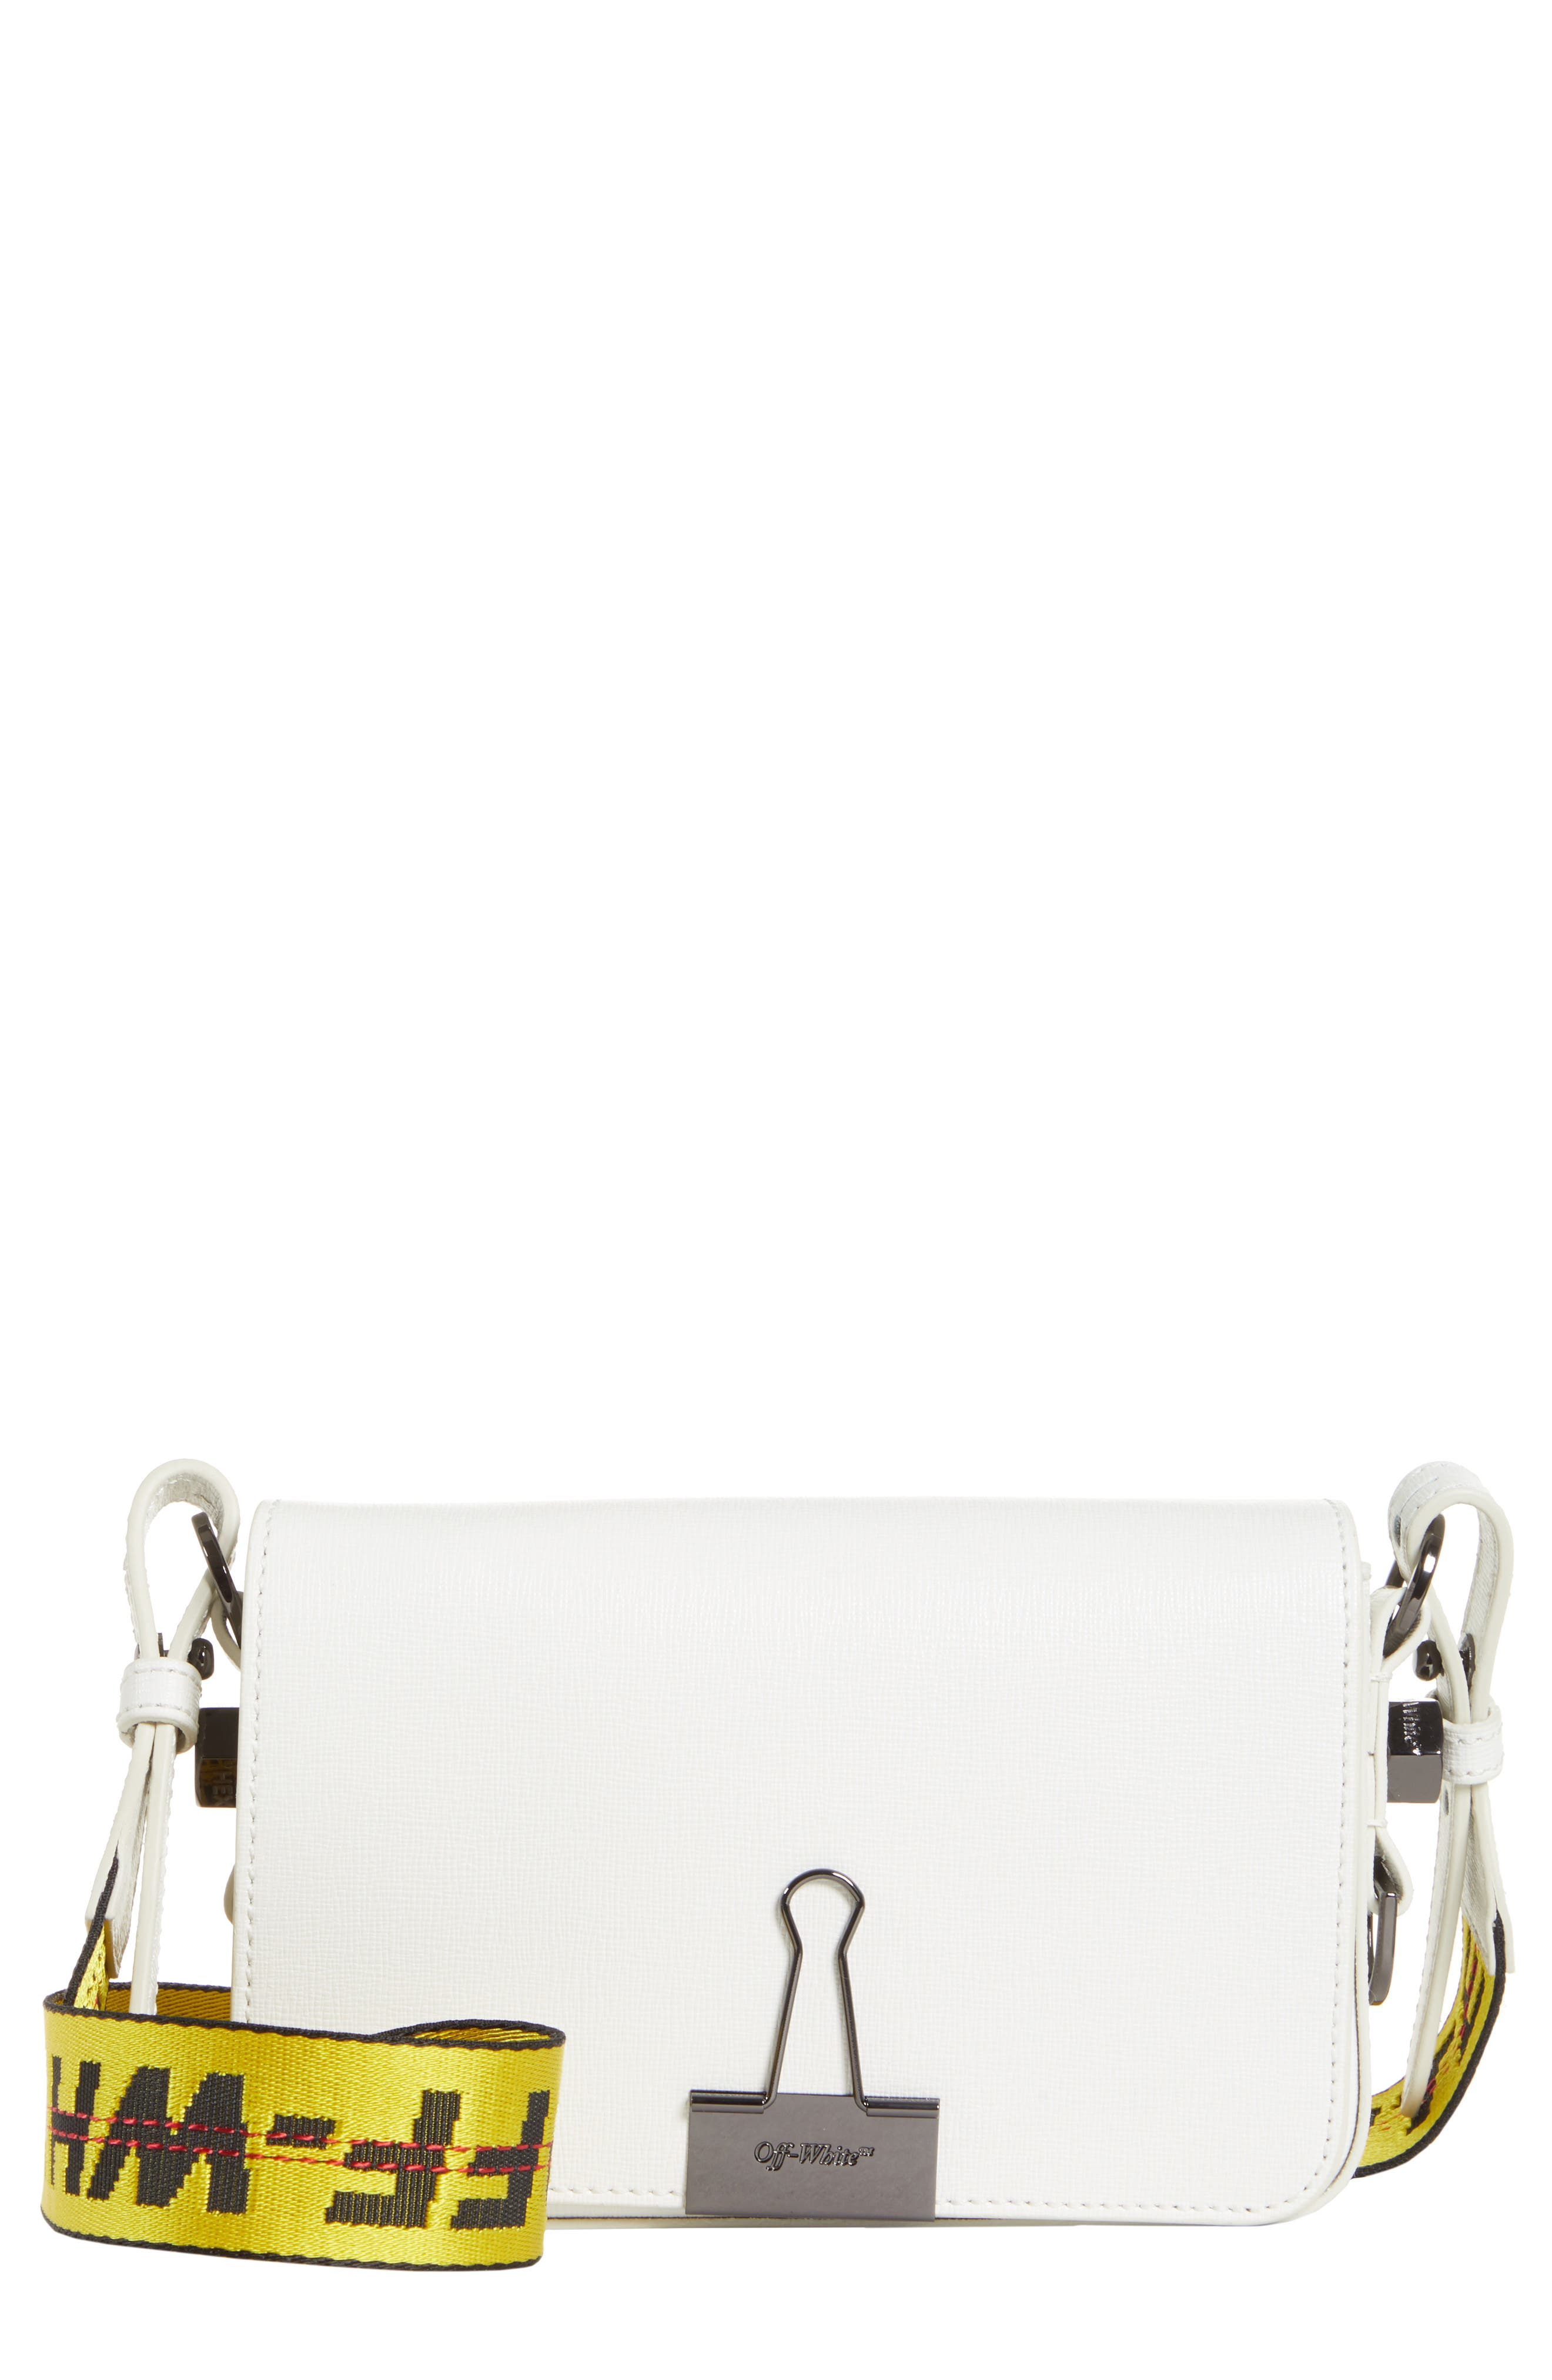 Mini Leather Flap Bag,                             Main thumbnail 1, color,                             WHITE NO COLOR